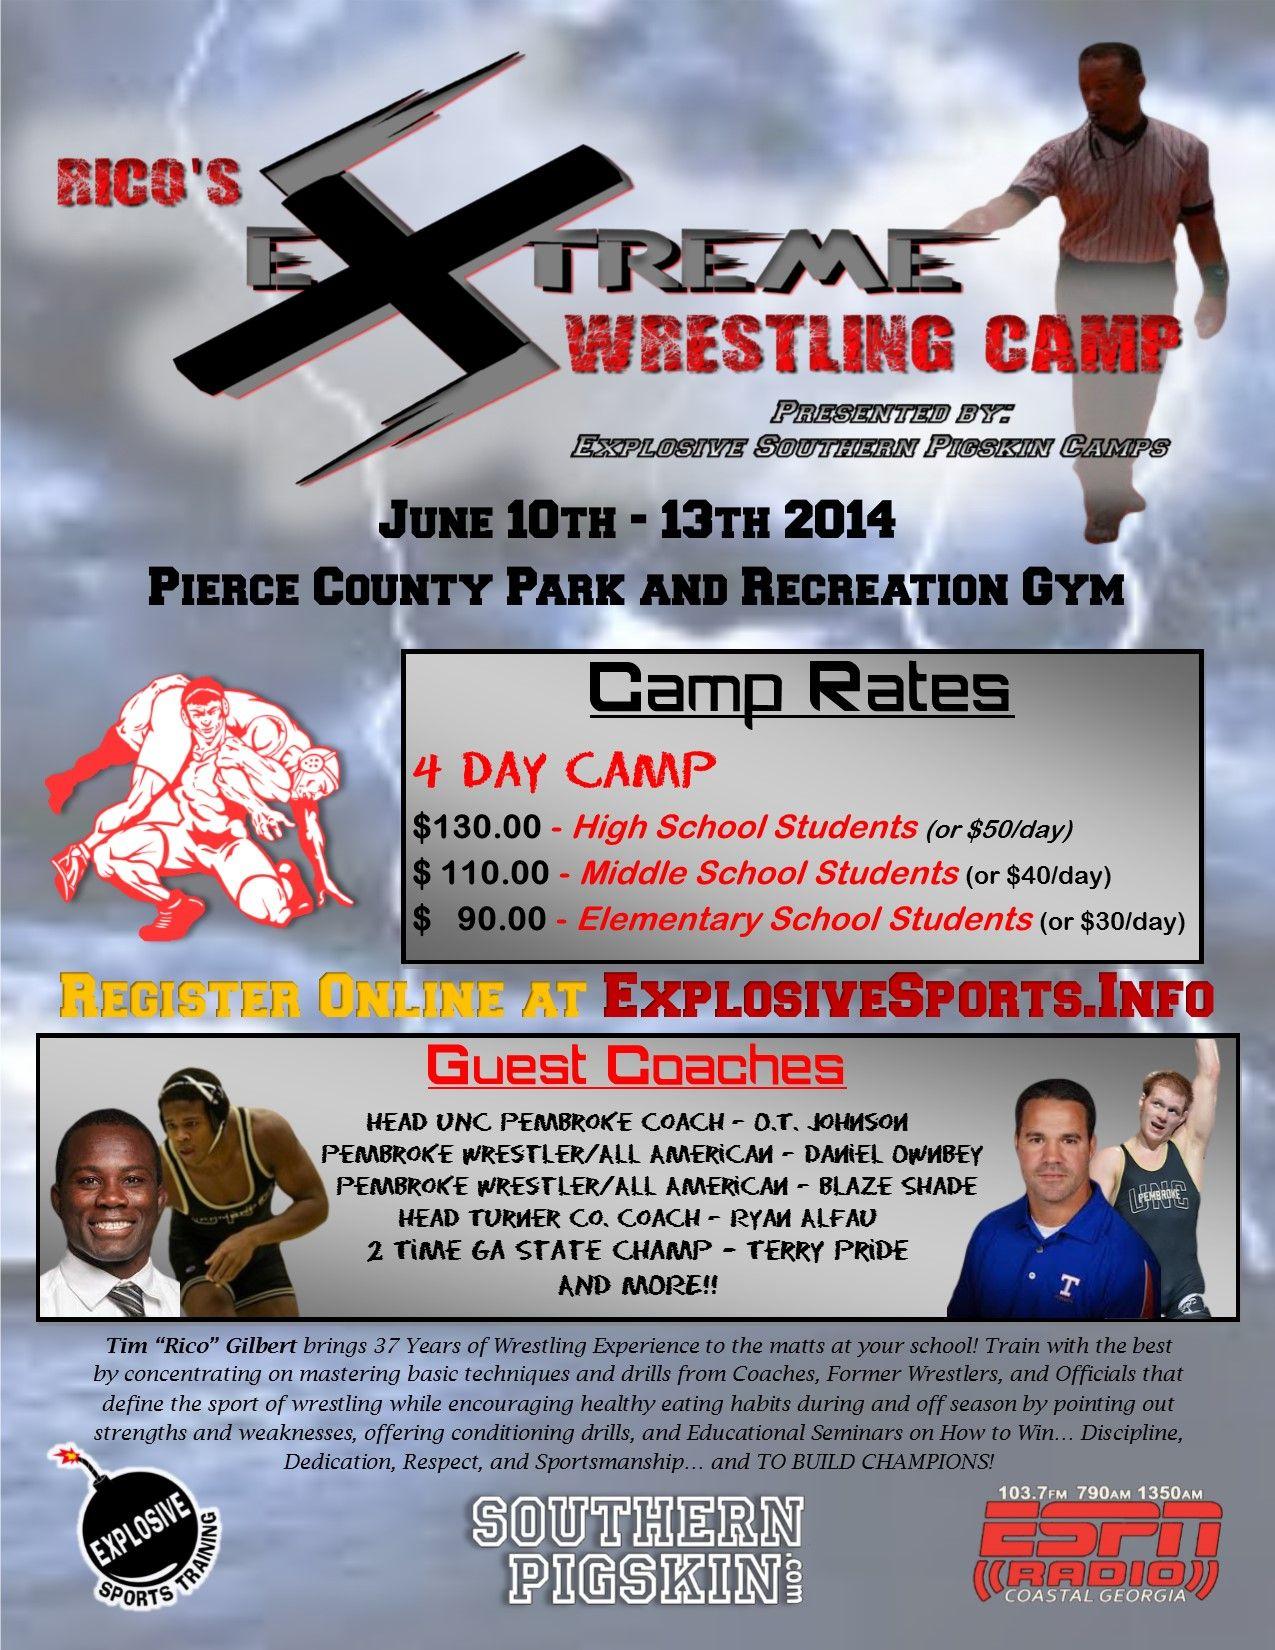 Colorado mesa university wrestling camp wrestling camp